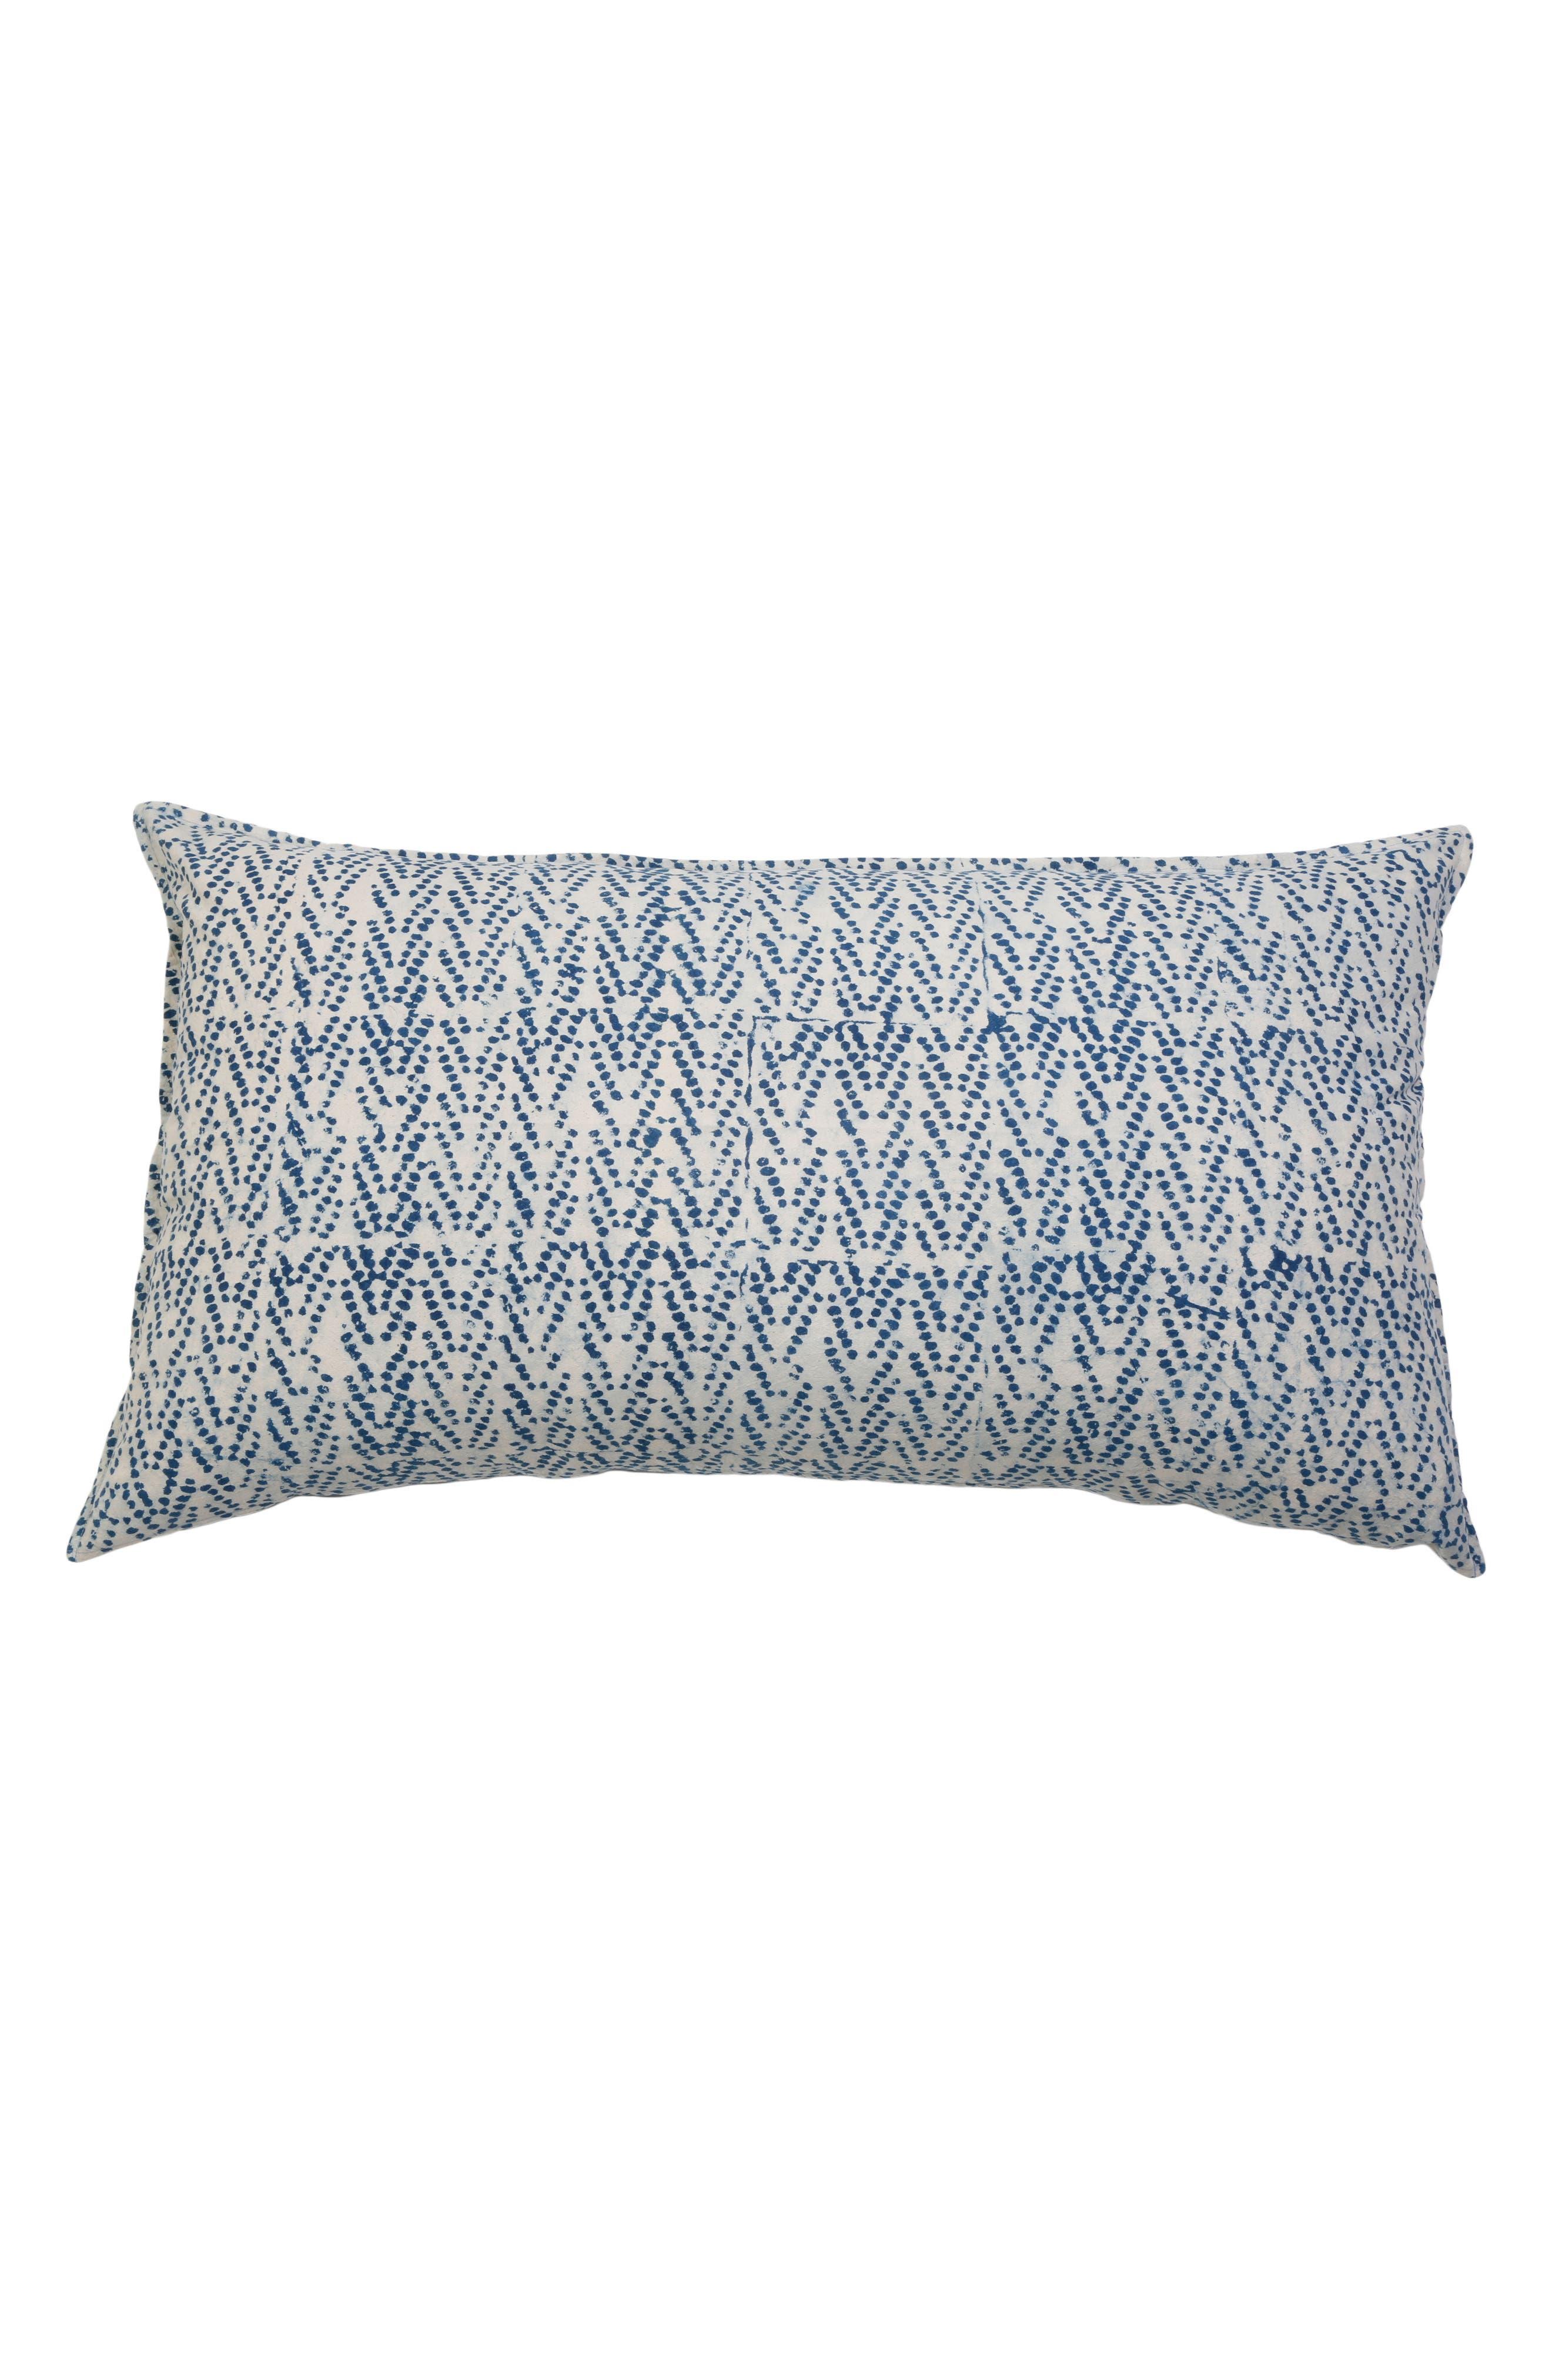 Indigo Dots Accent Pillow,                         Main,                         color, Blue Multi